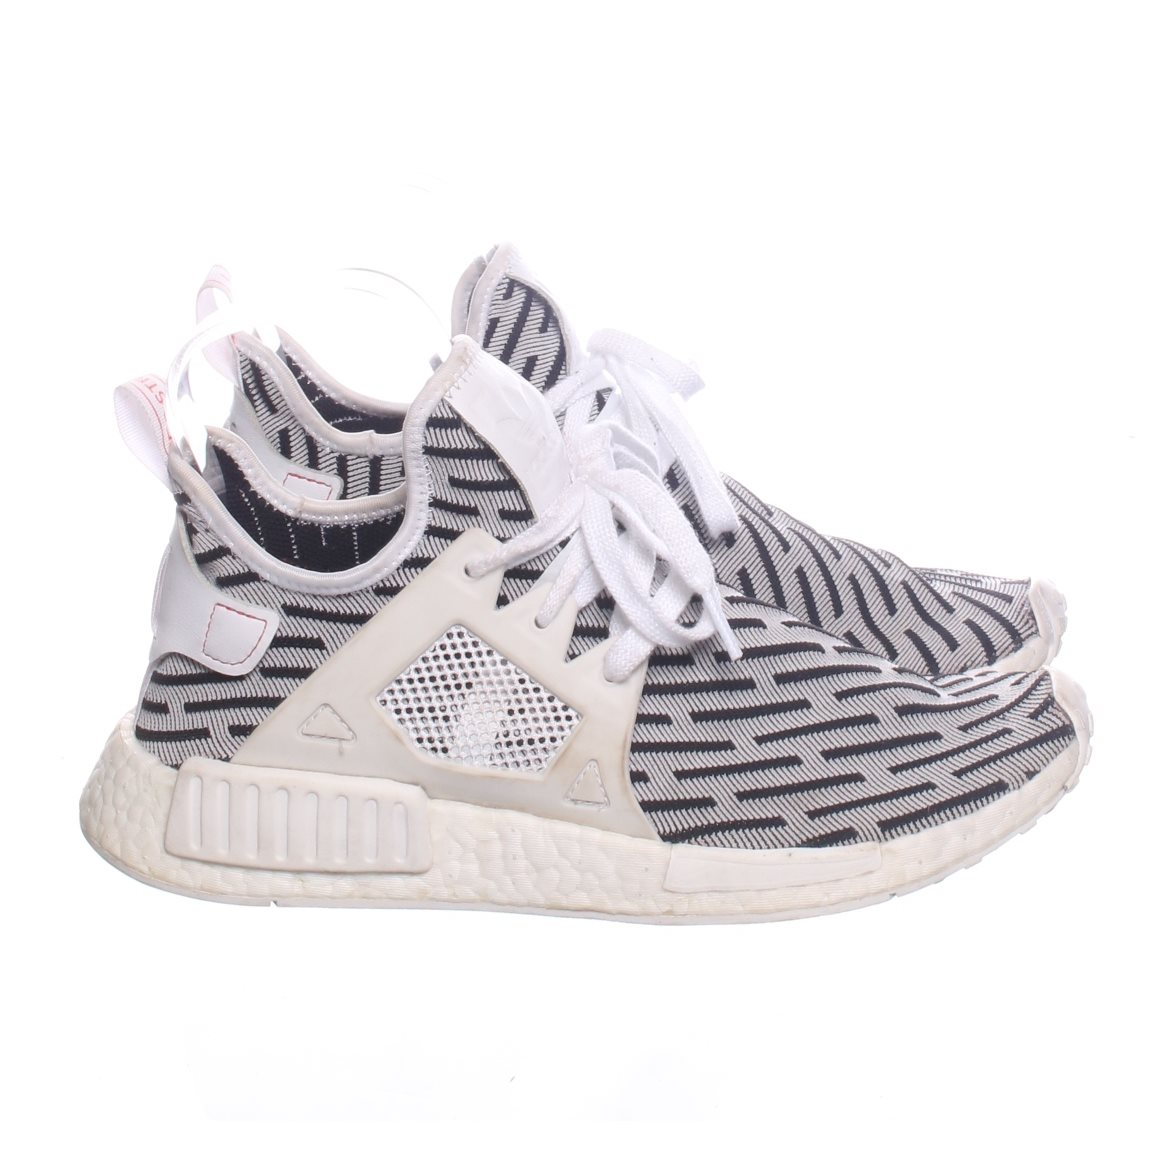 adidas Gazelle Primeknit Low Top Sneakers Green NWT